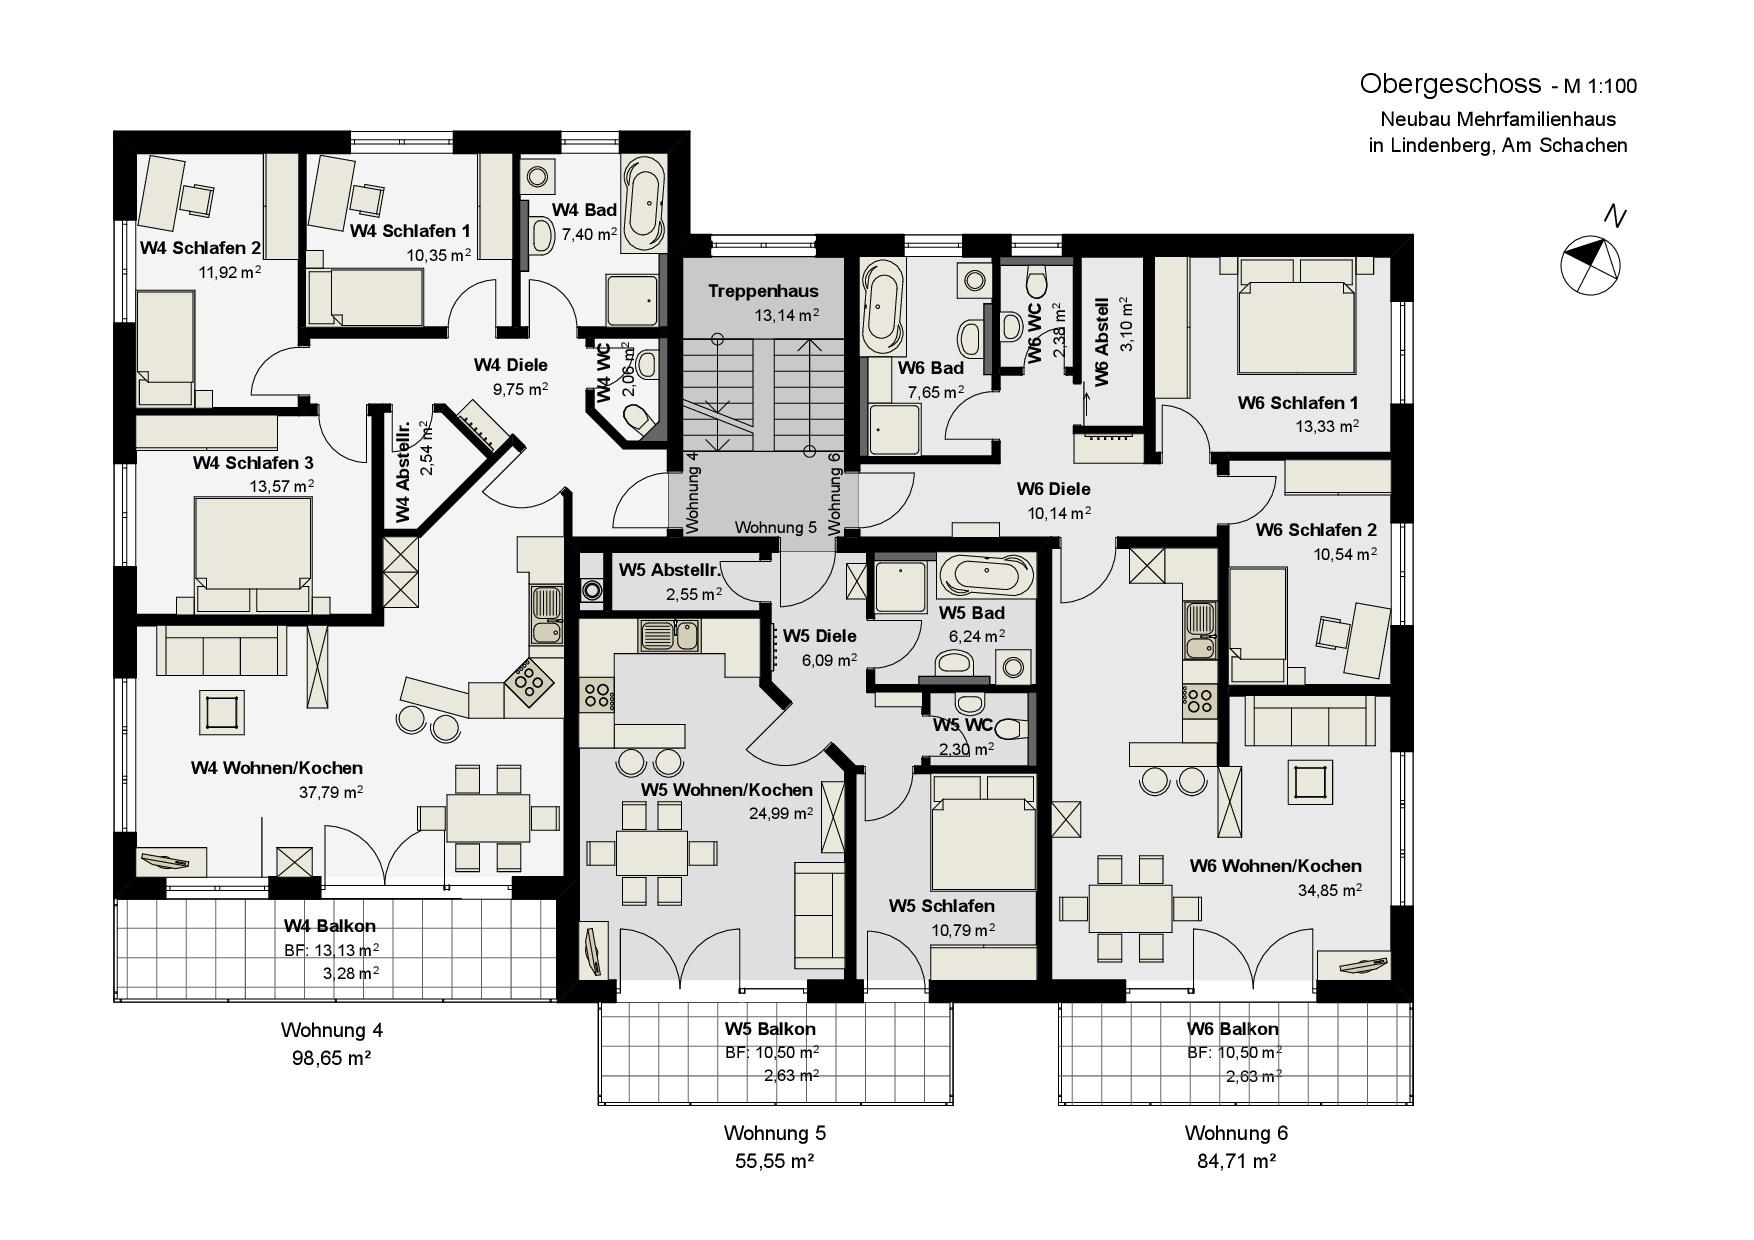 Treppenhaus grundriss mehrfamilienhaus  Mehrfamilienhaus - Planungsbüro Edgar Popp, Lindenberg im Allgäu